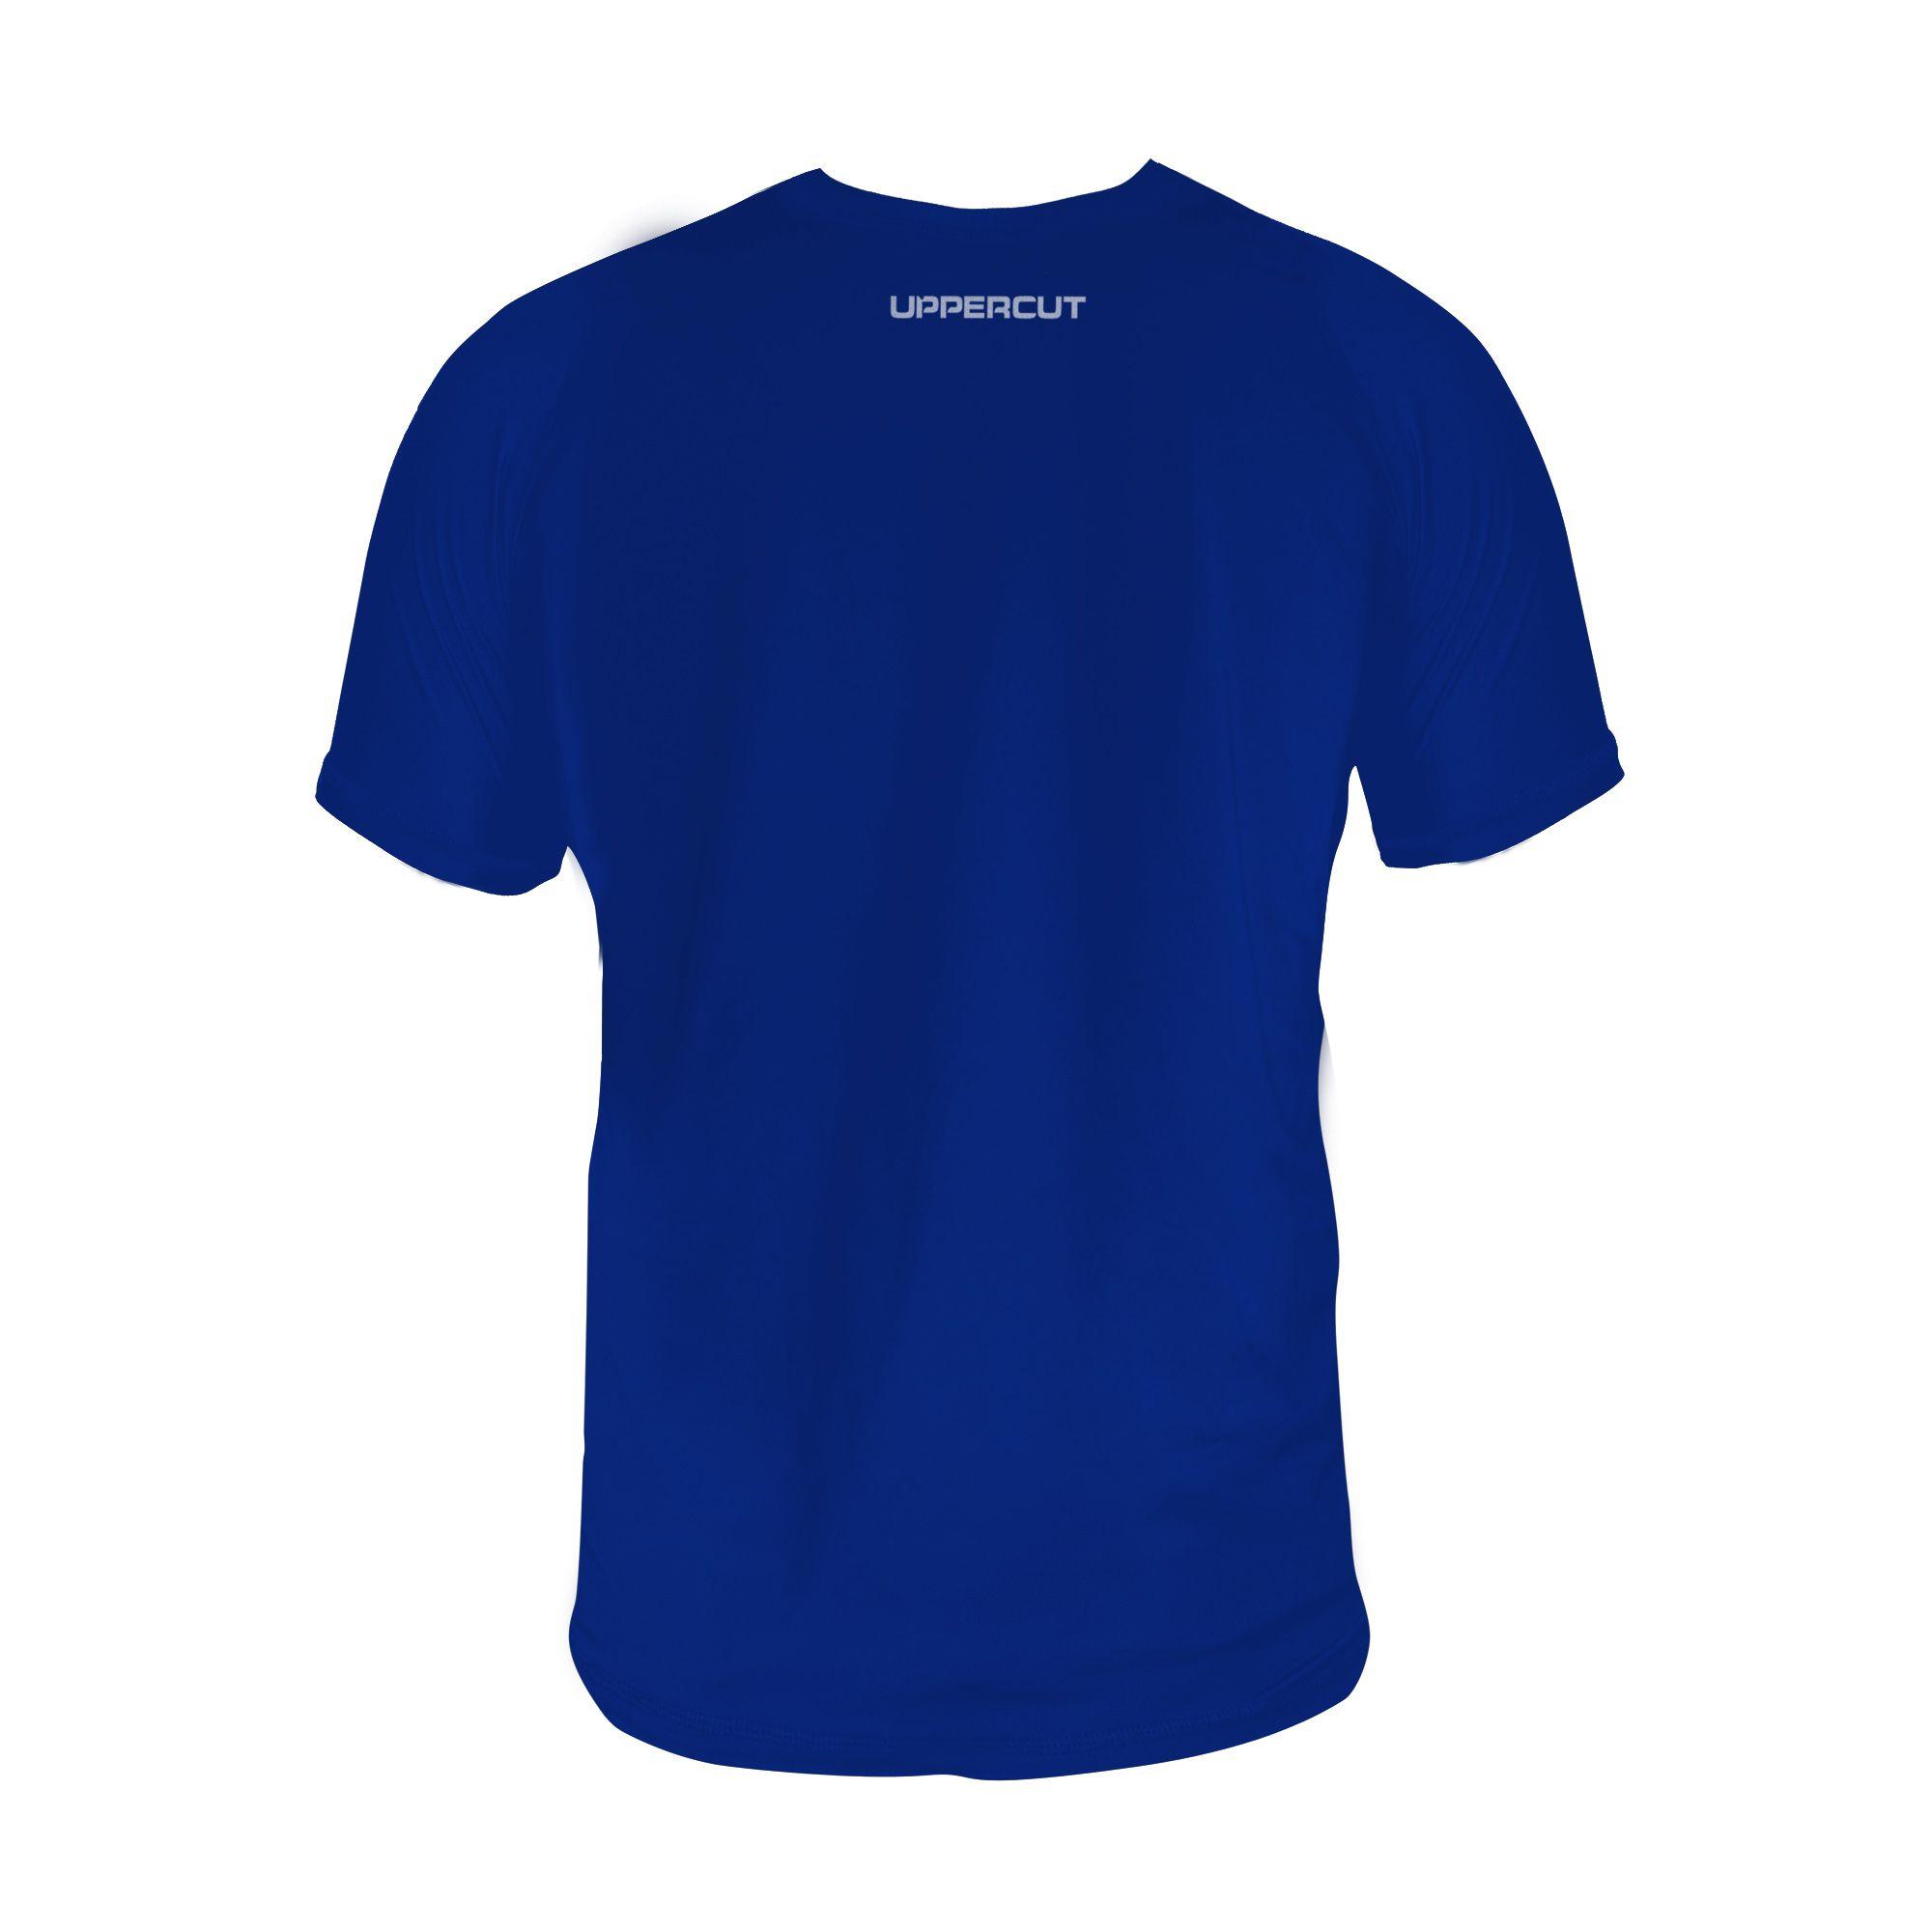 Camiseta Karate U-xx - Treino Passeio Dry Fit UV50+ - Azul